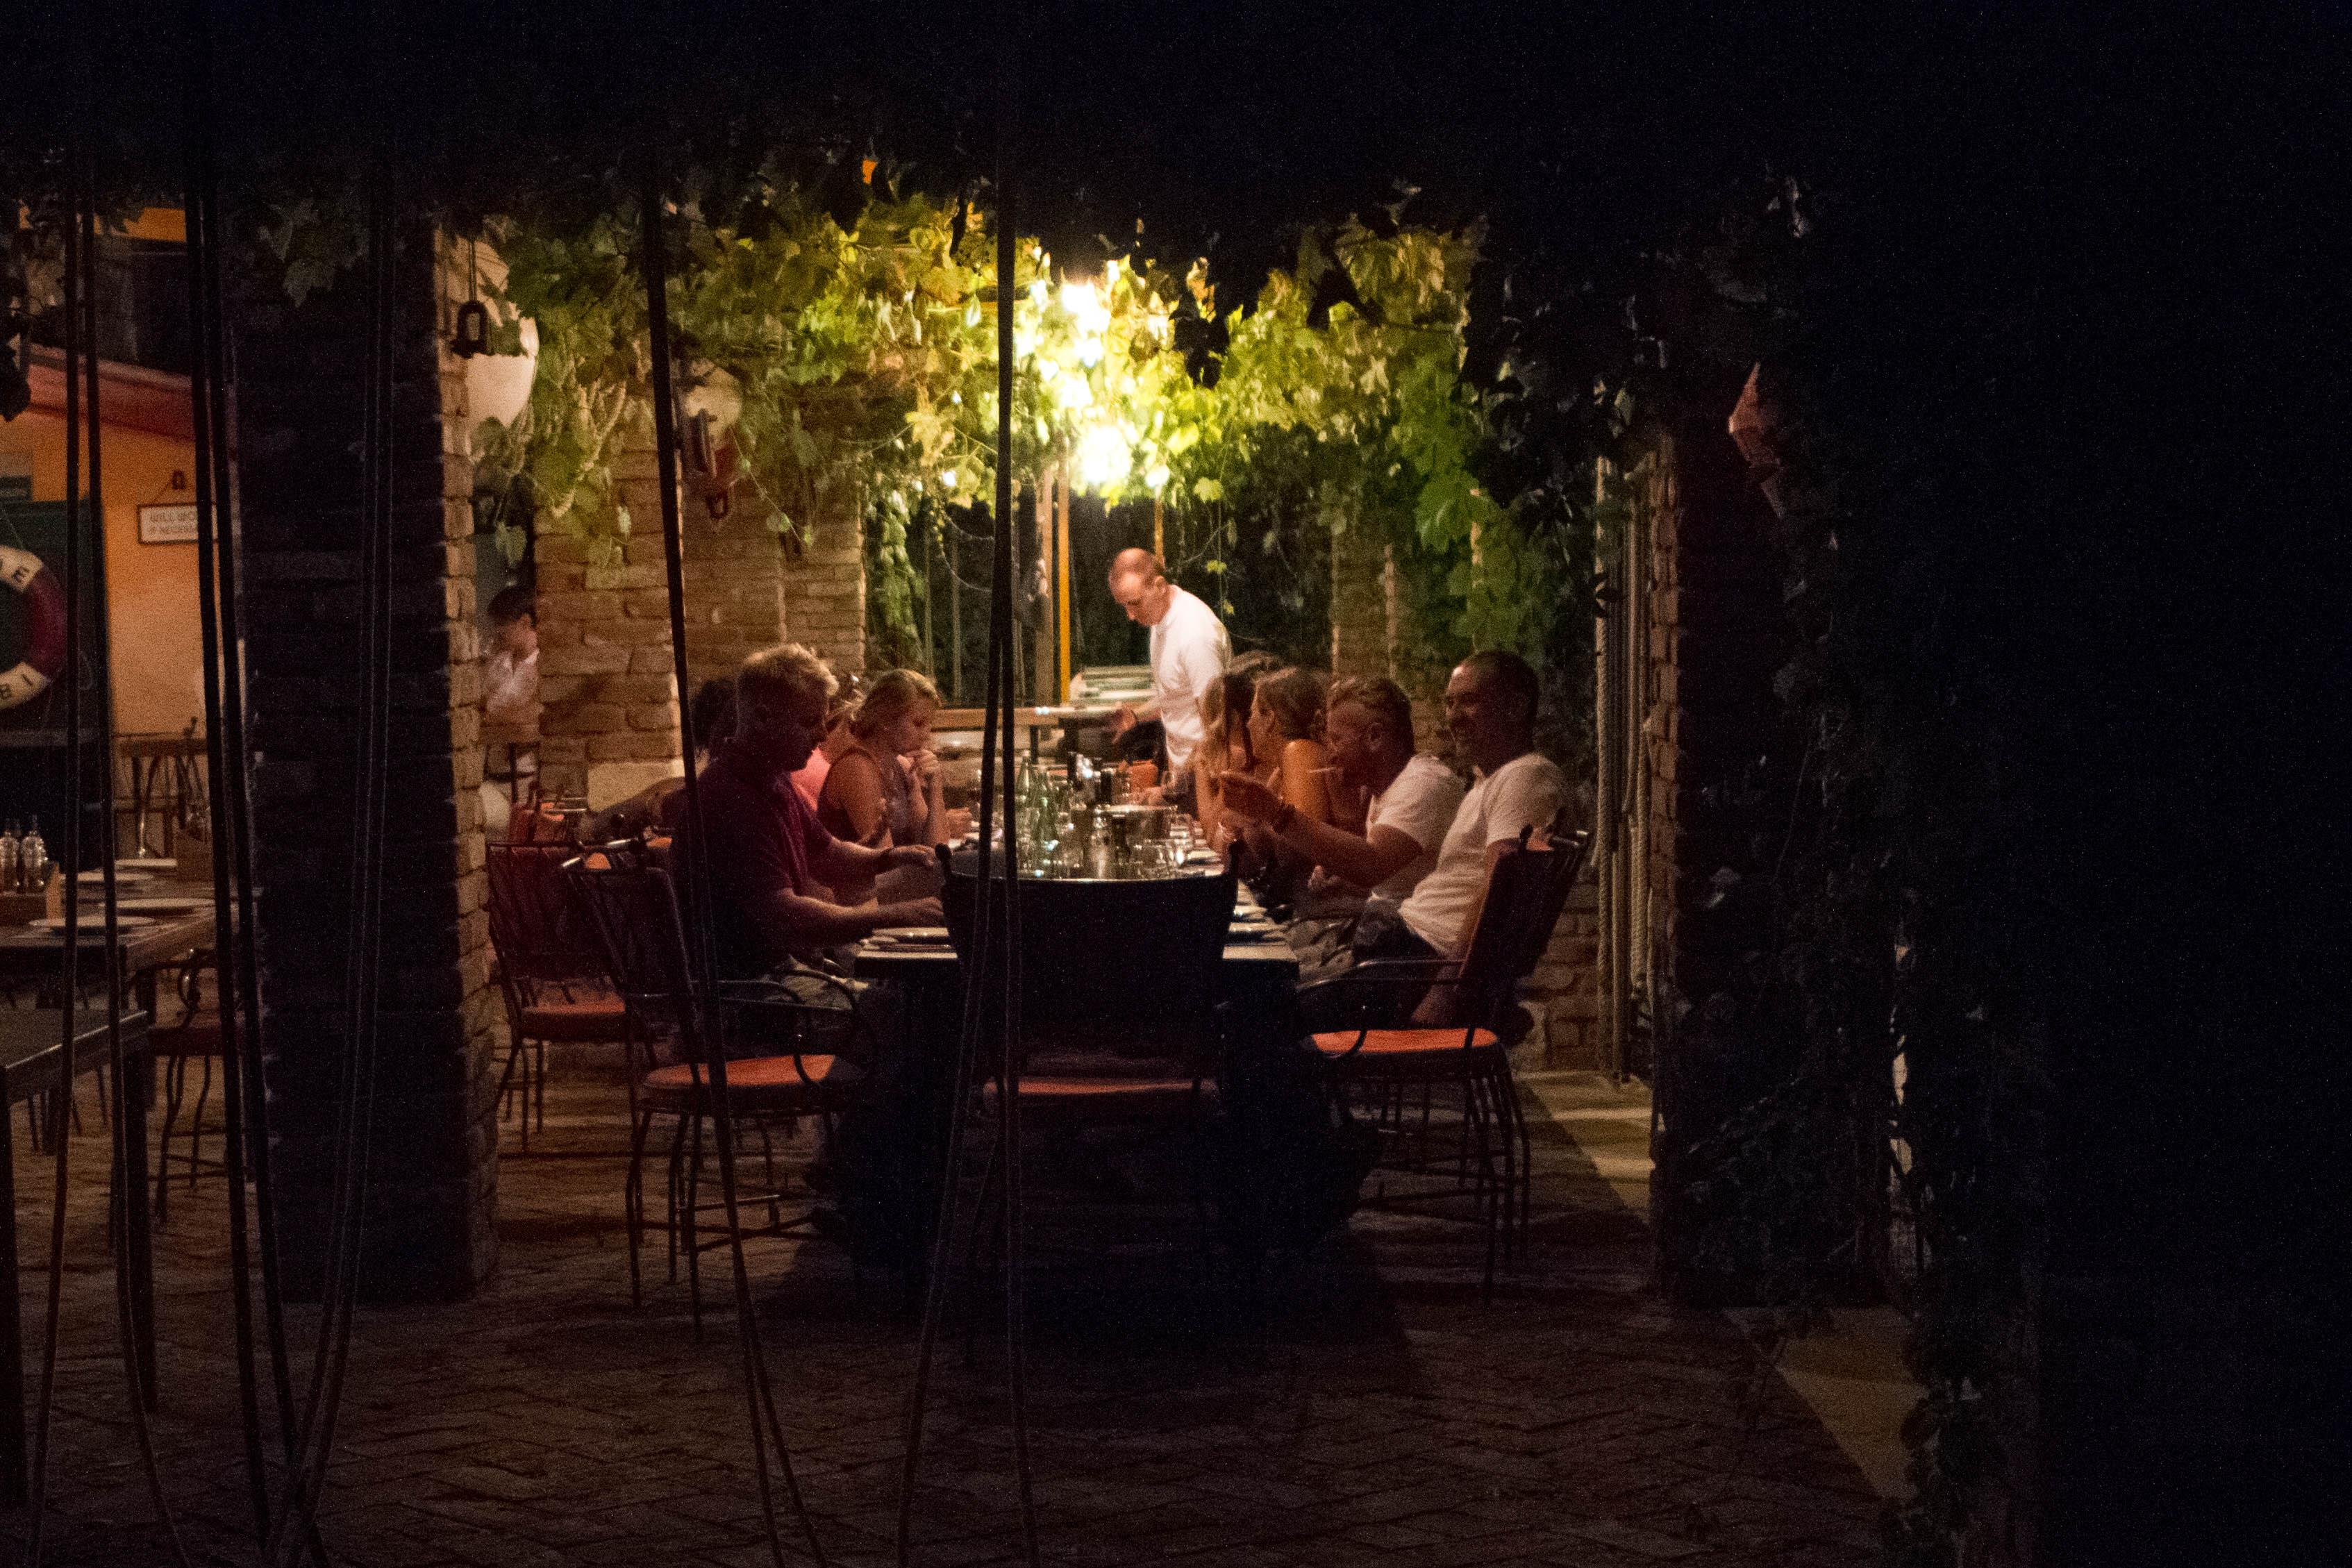 Dining alfresco_Tuna Bar_Trpanj_Peljesac